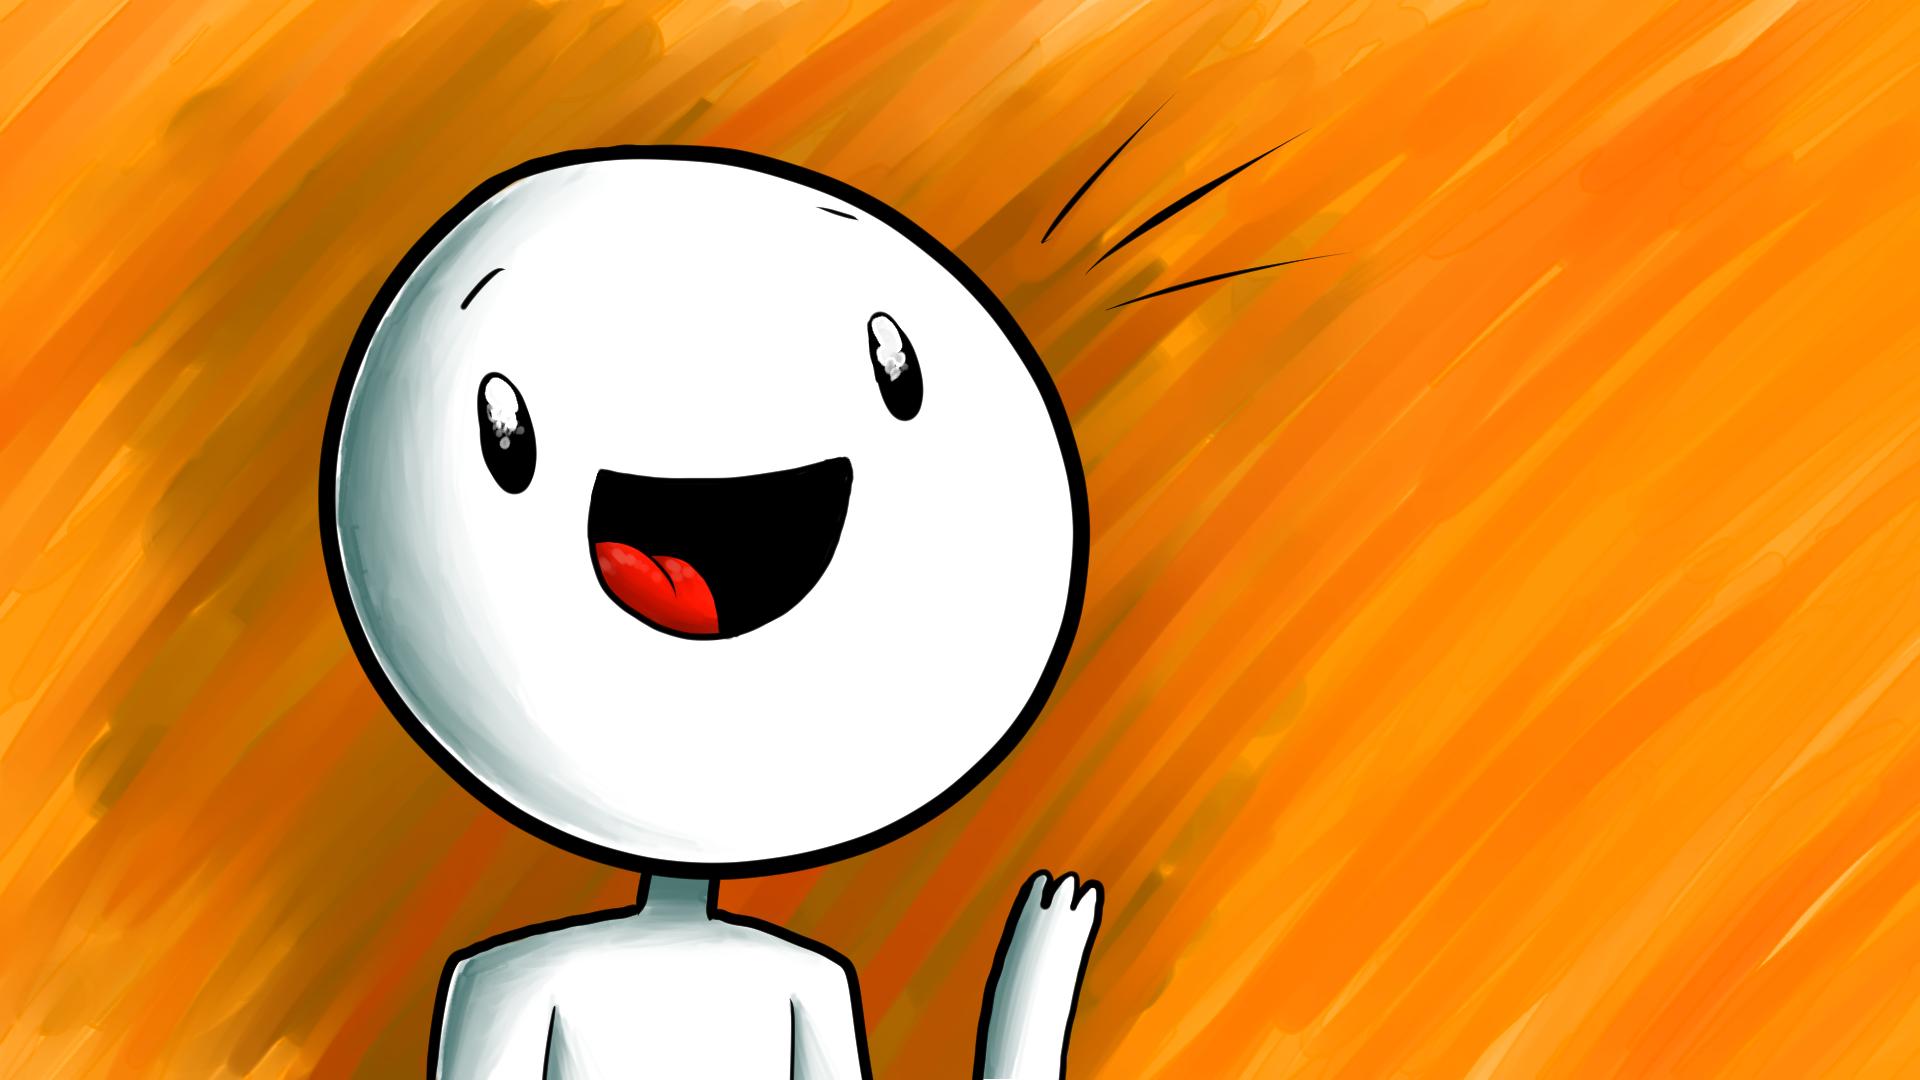 a blank guy waving